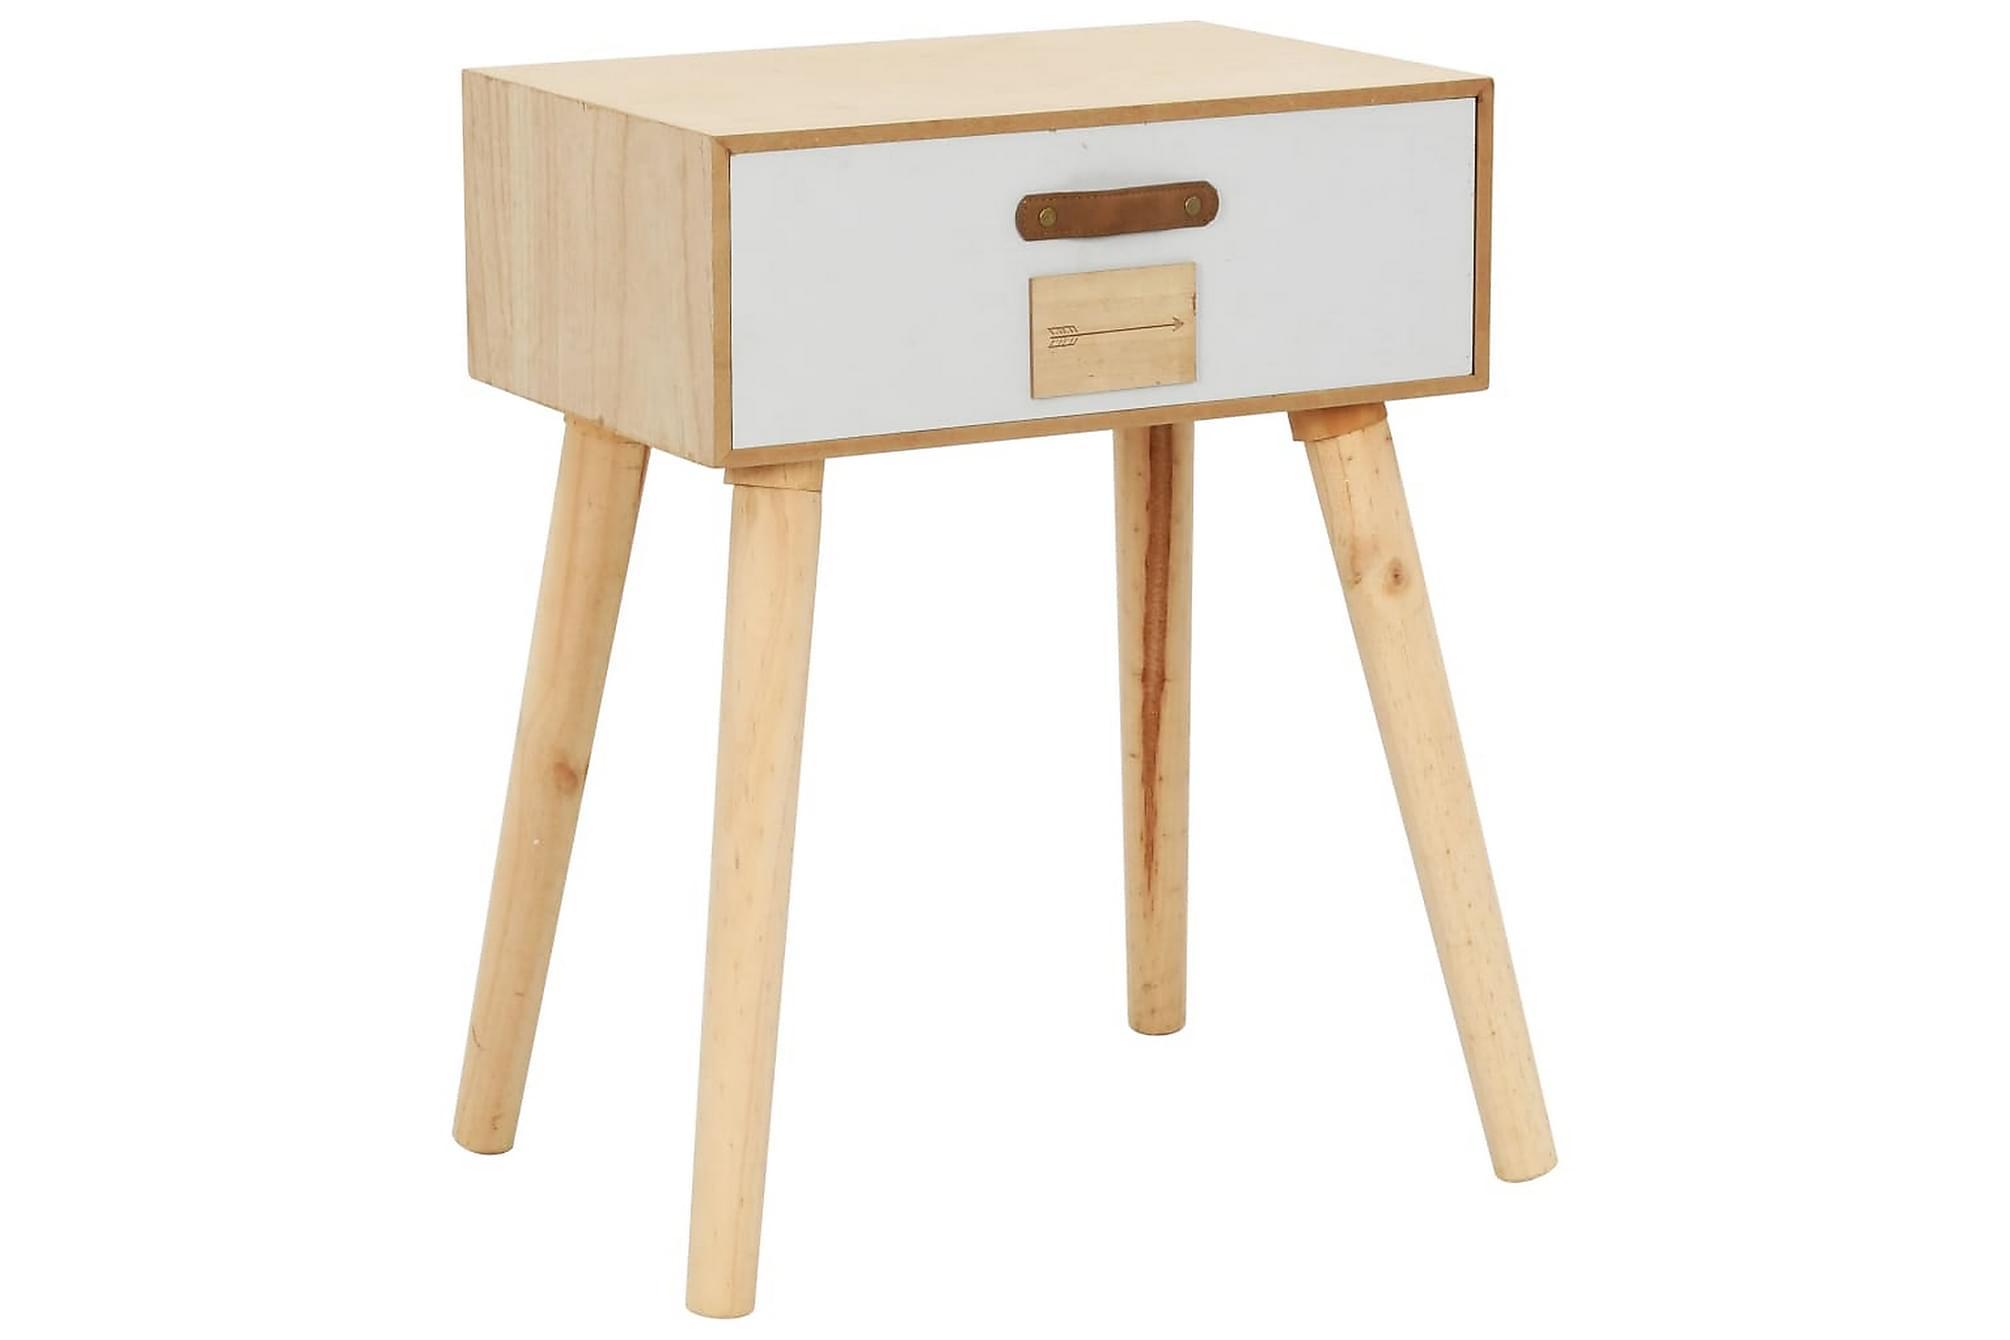 Sängbord med låda 44x30x58,5 cm massiv furu